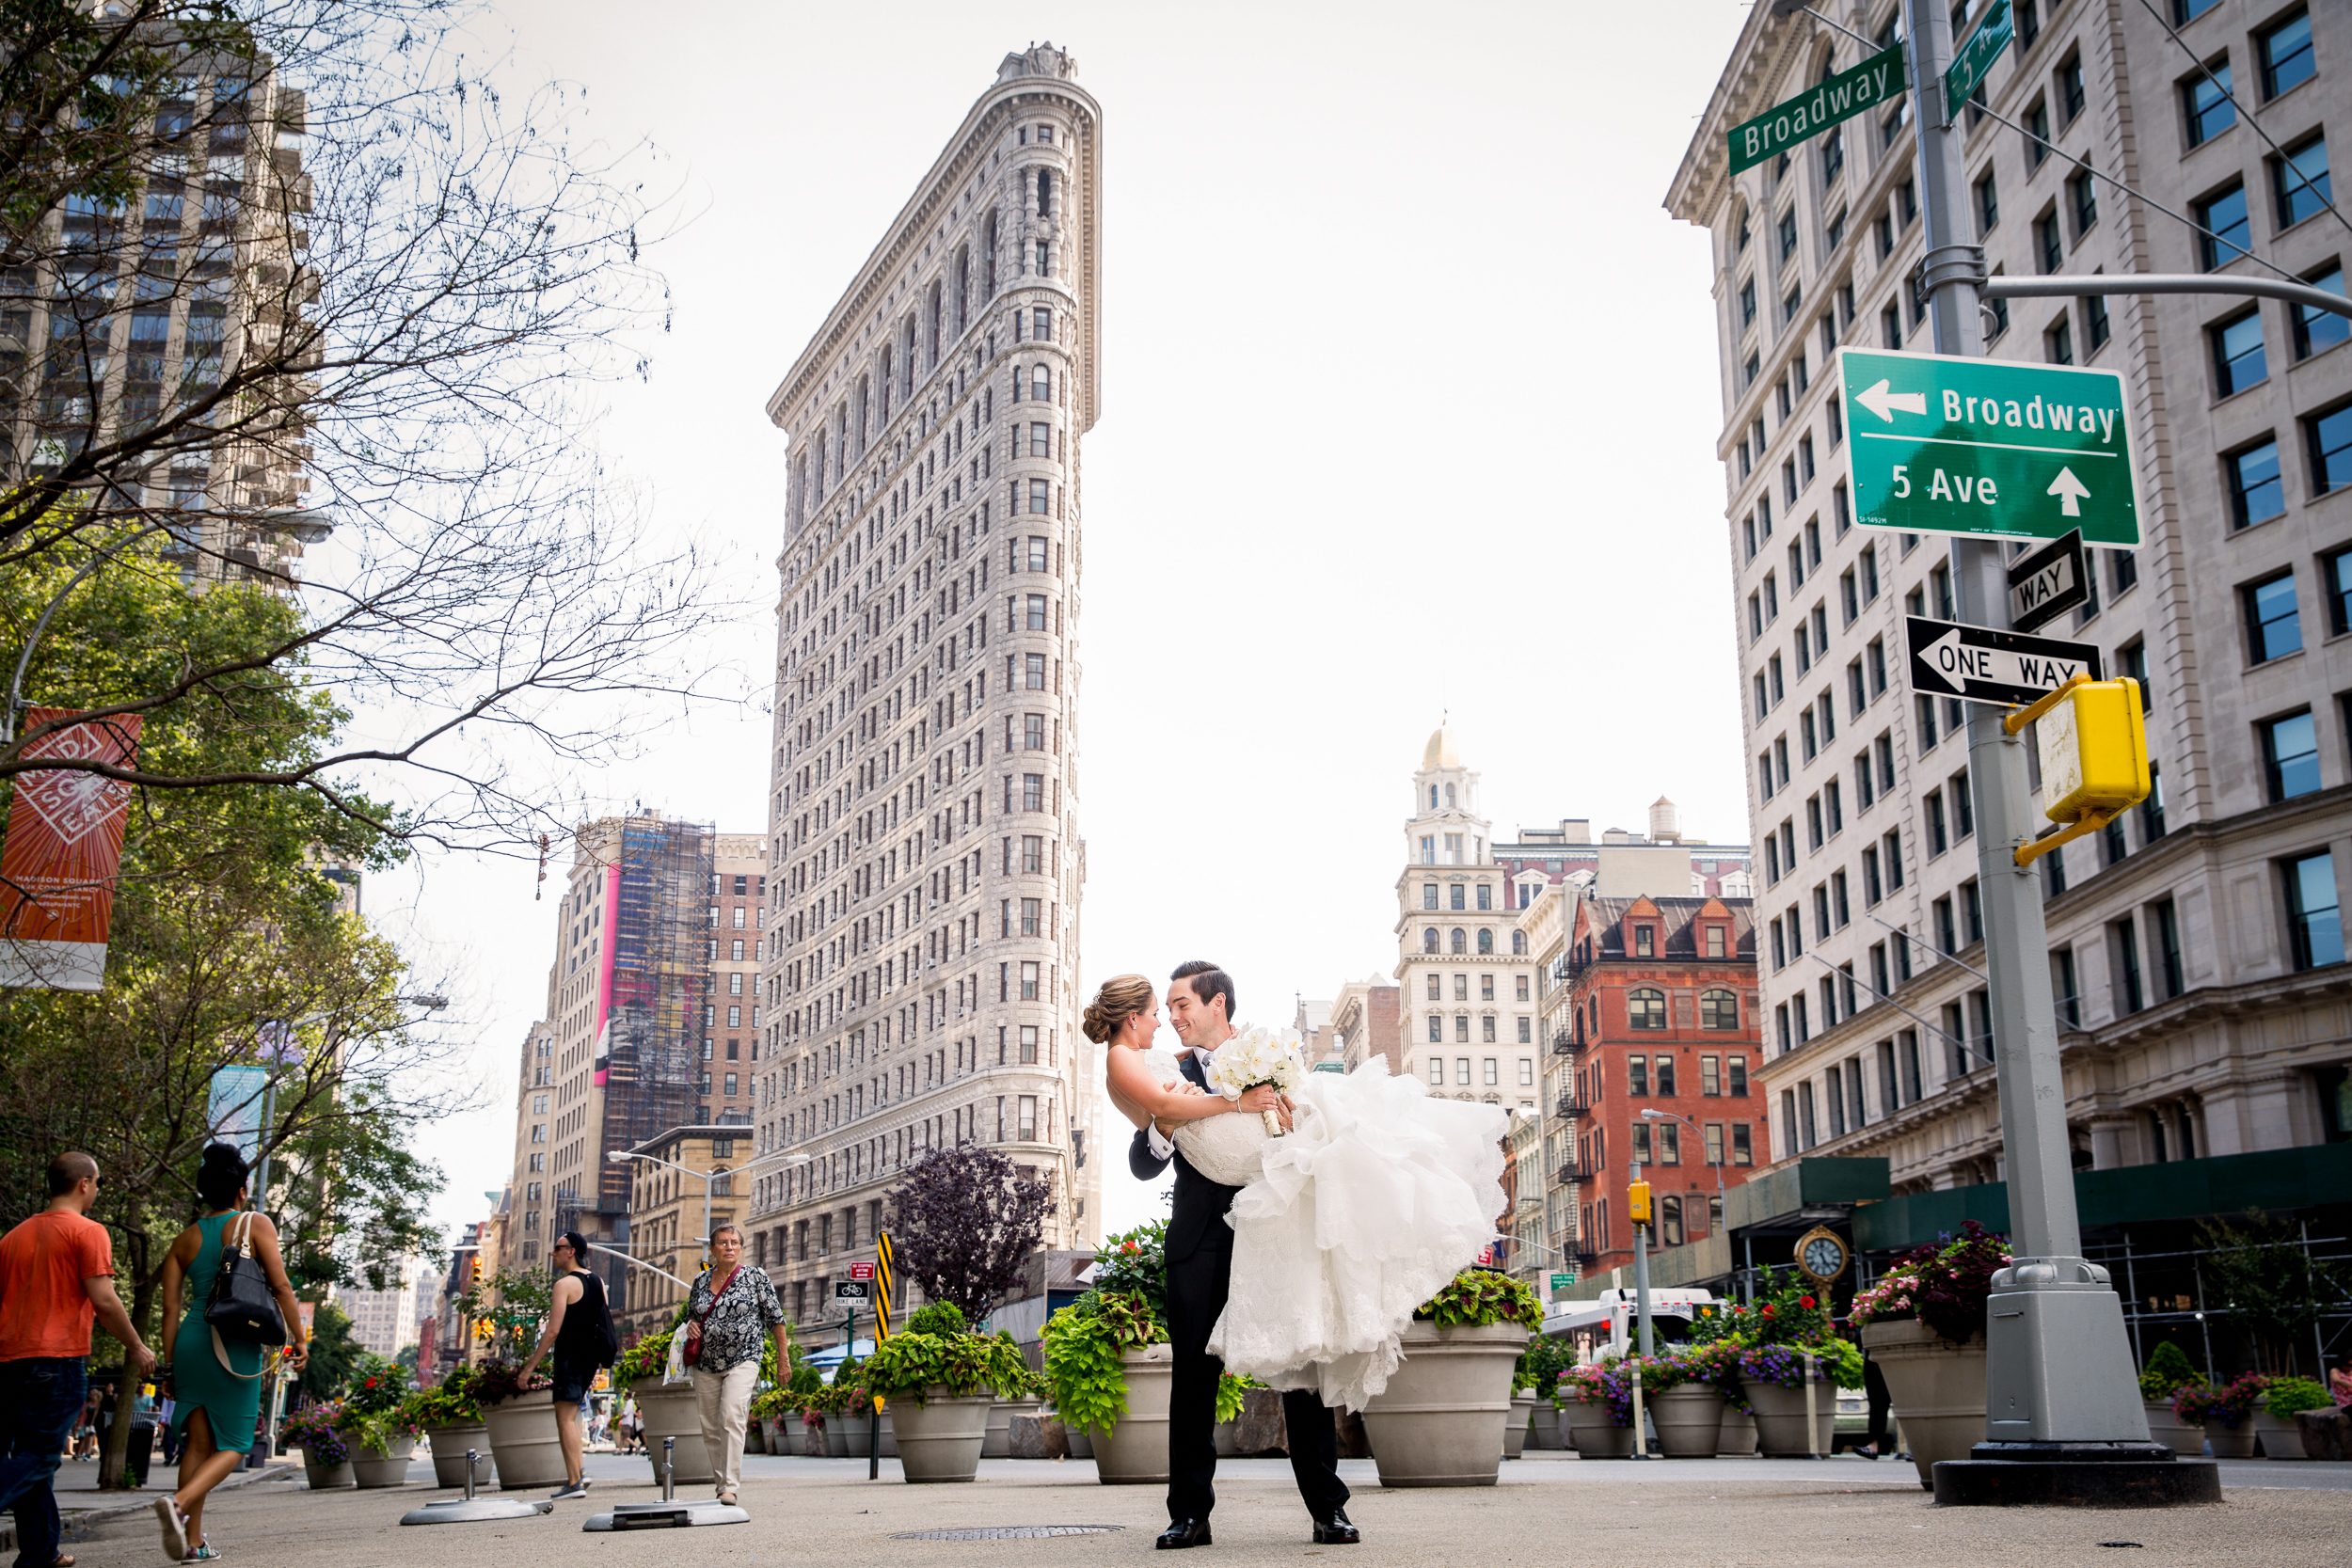 Ceci_New_York_Style_Luxury_Custom_Summer_Wedding_CeciBride_Letterpress_NewYork_Foil_Lighthouse_Chelsea_Piers_26.jpg